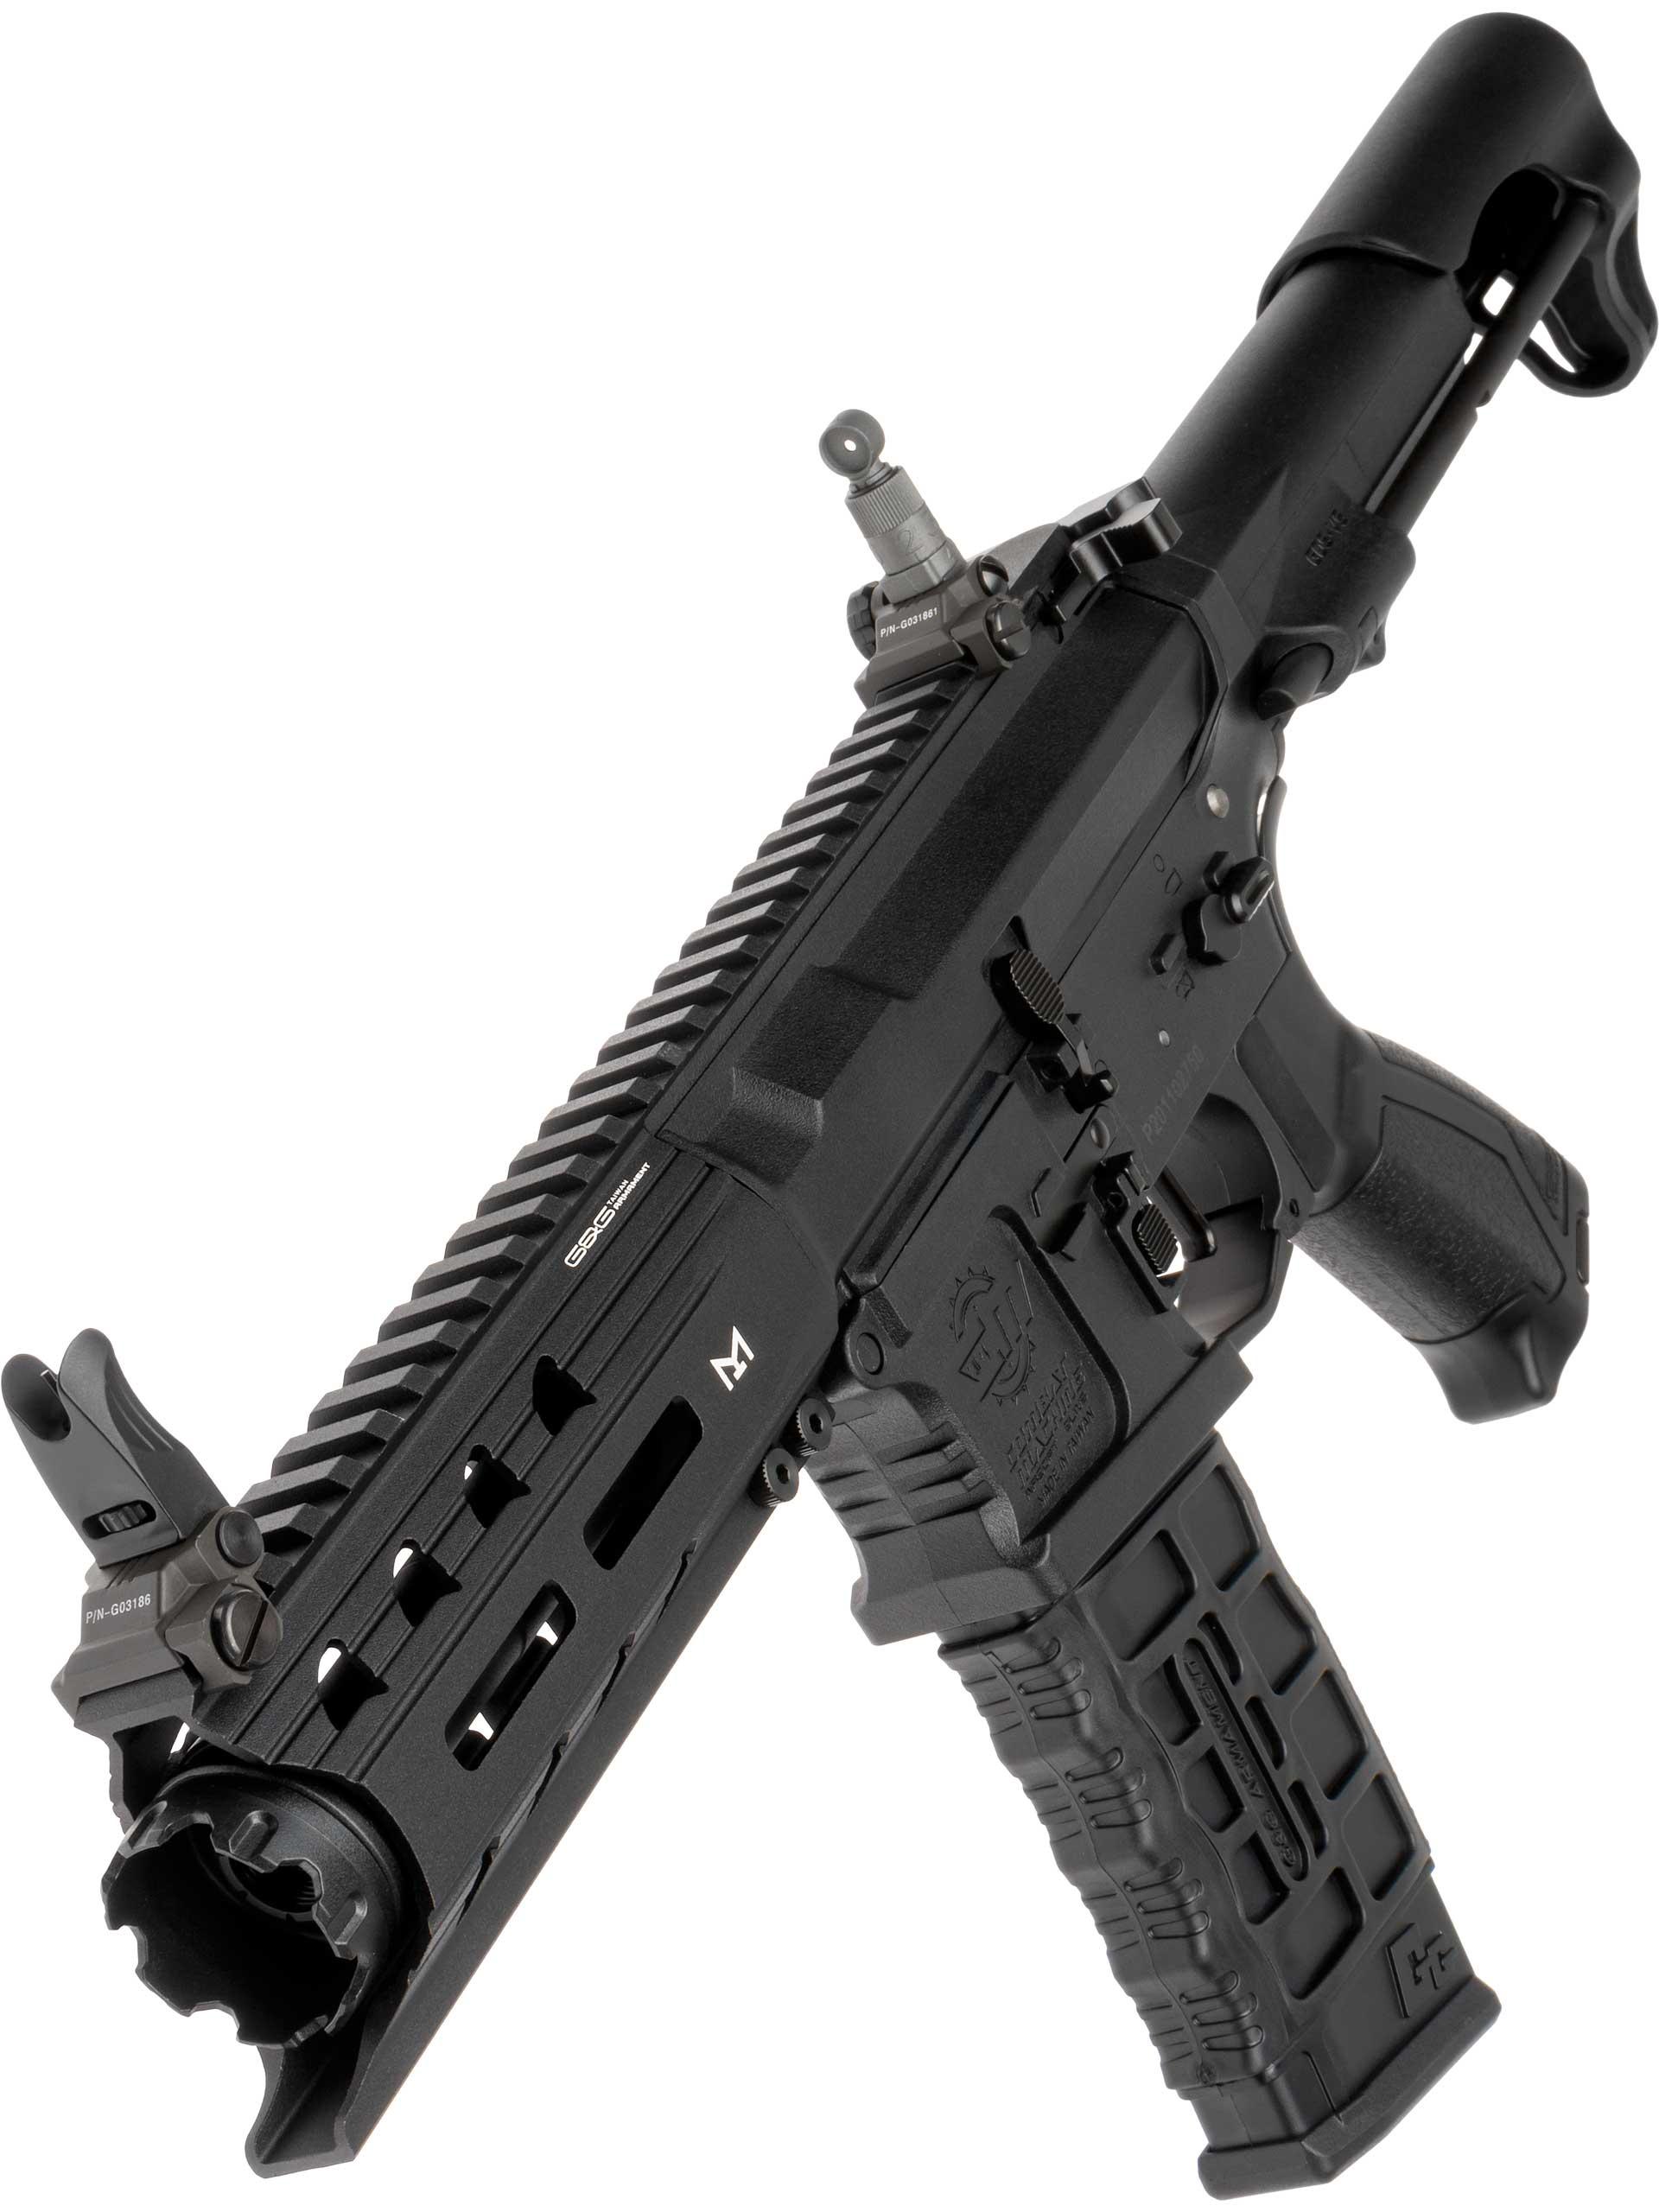 G&G Armament ARP556 V2S AEG